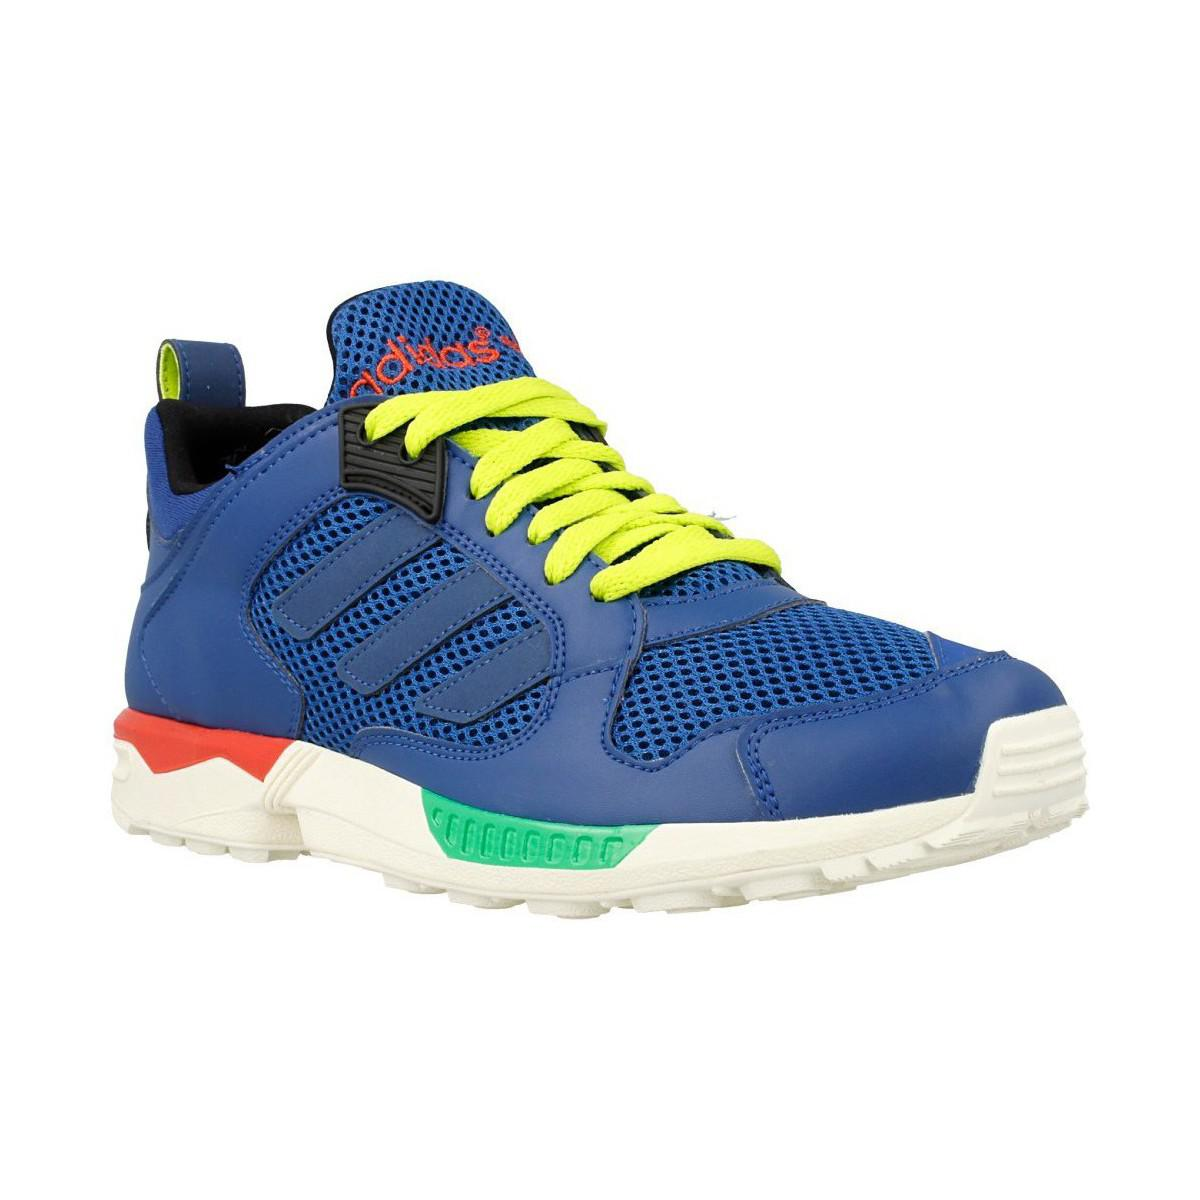 8e8739c15 adidas Originals Zx 5000 Rspn Men s Shoes (trainers) In Multicolour ...